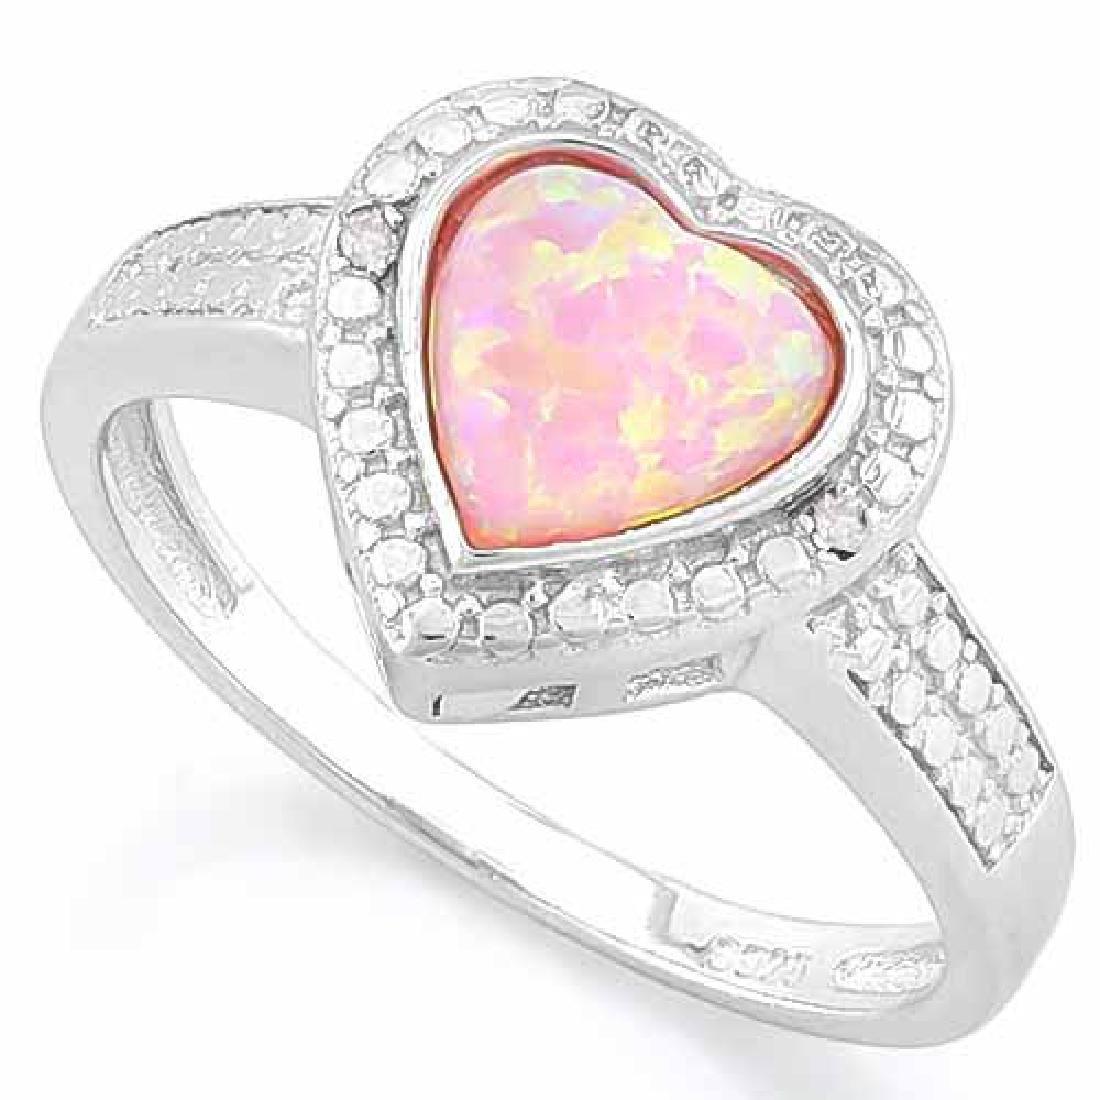 3/5 CARAT CREATED RAINBOW OPAL & DIAMOND 925 STERLING S